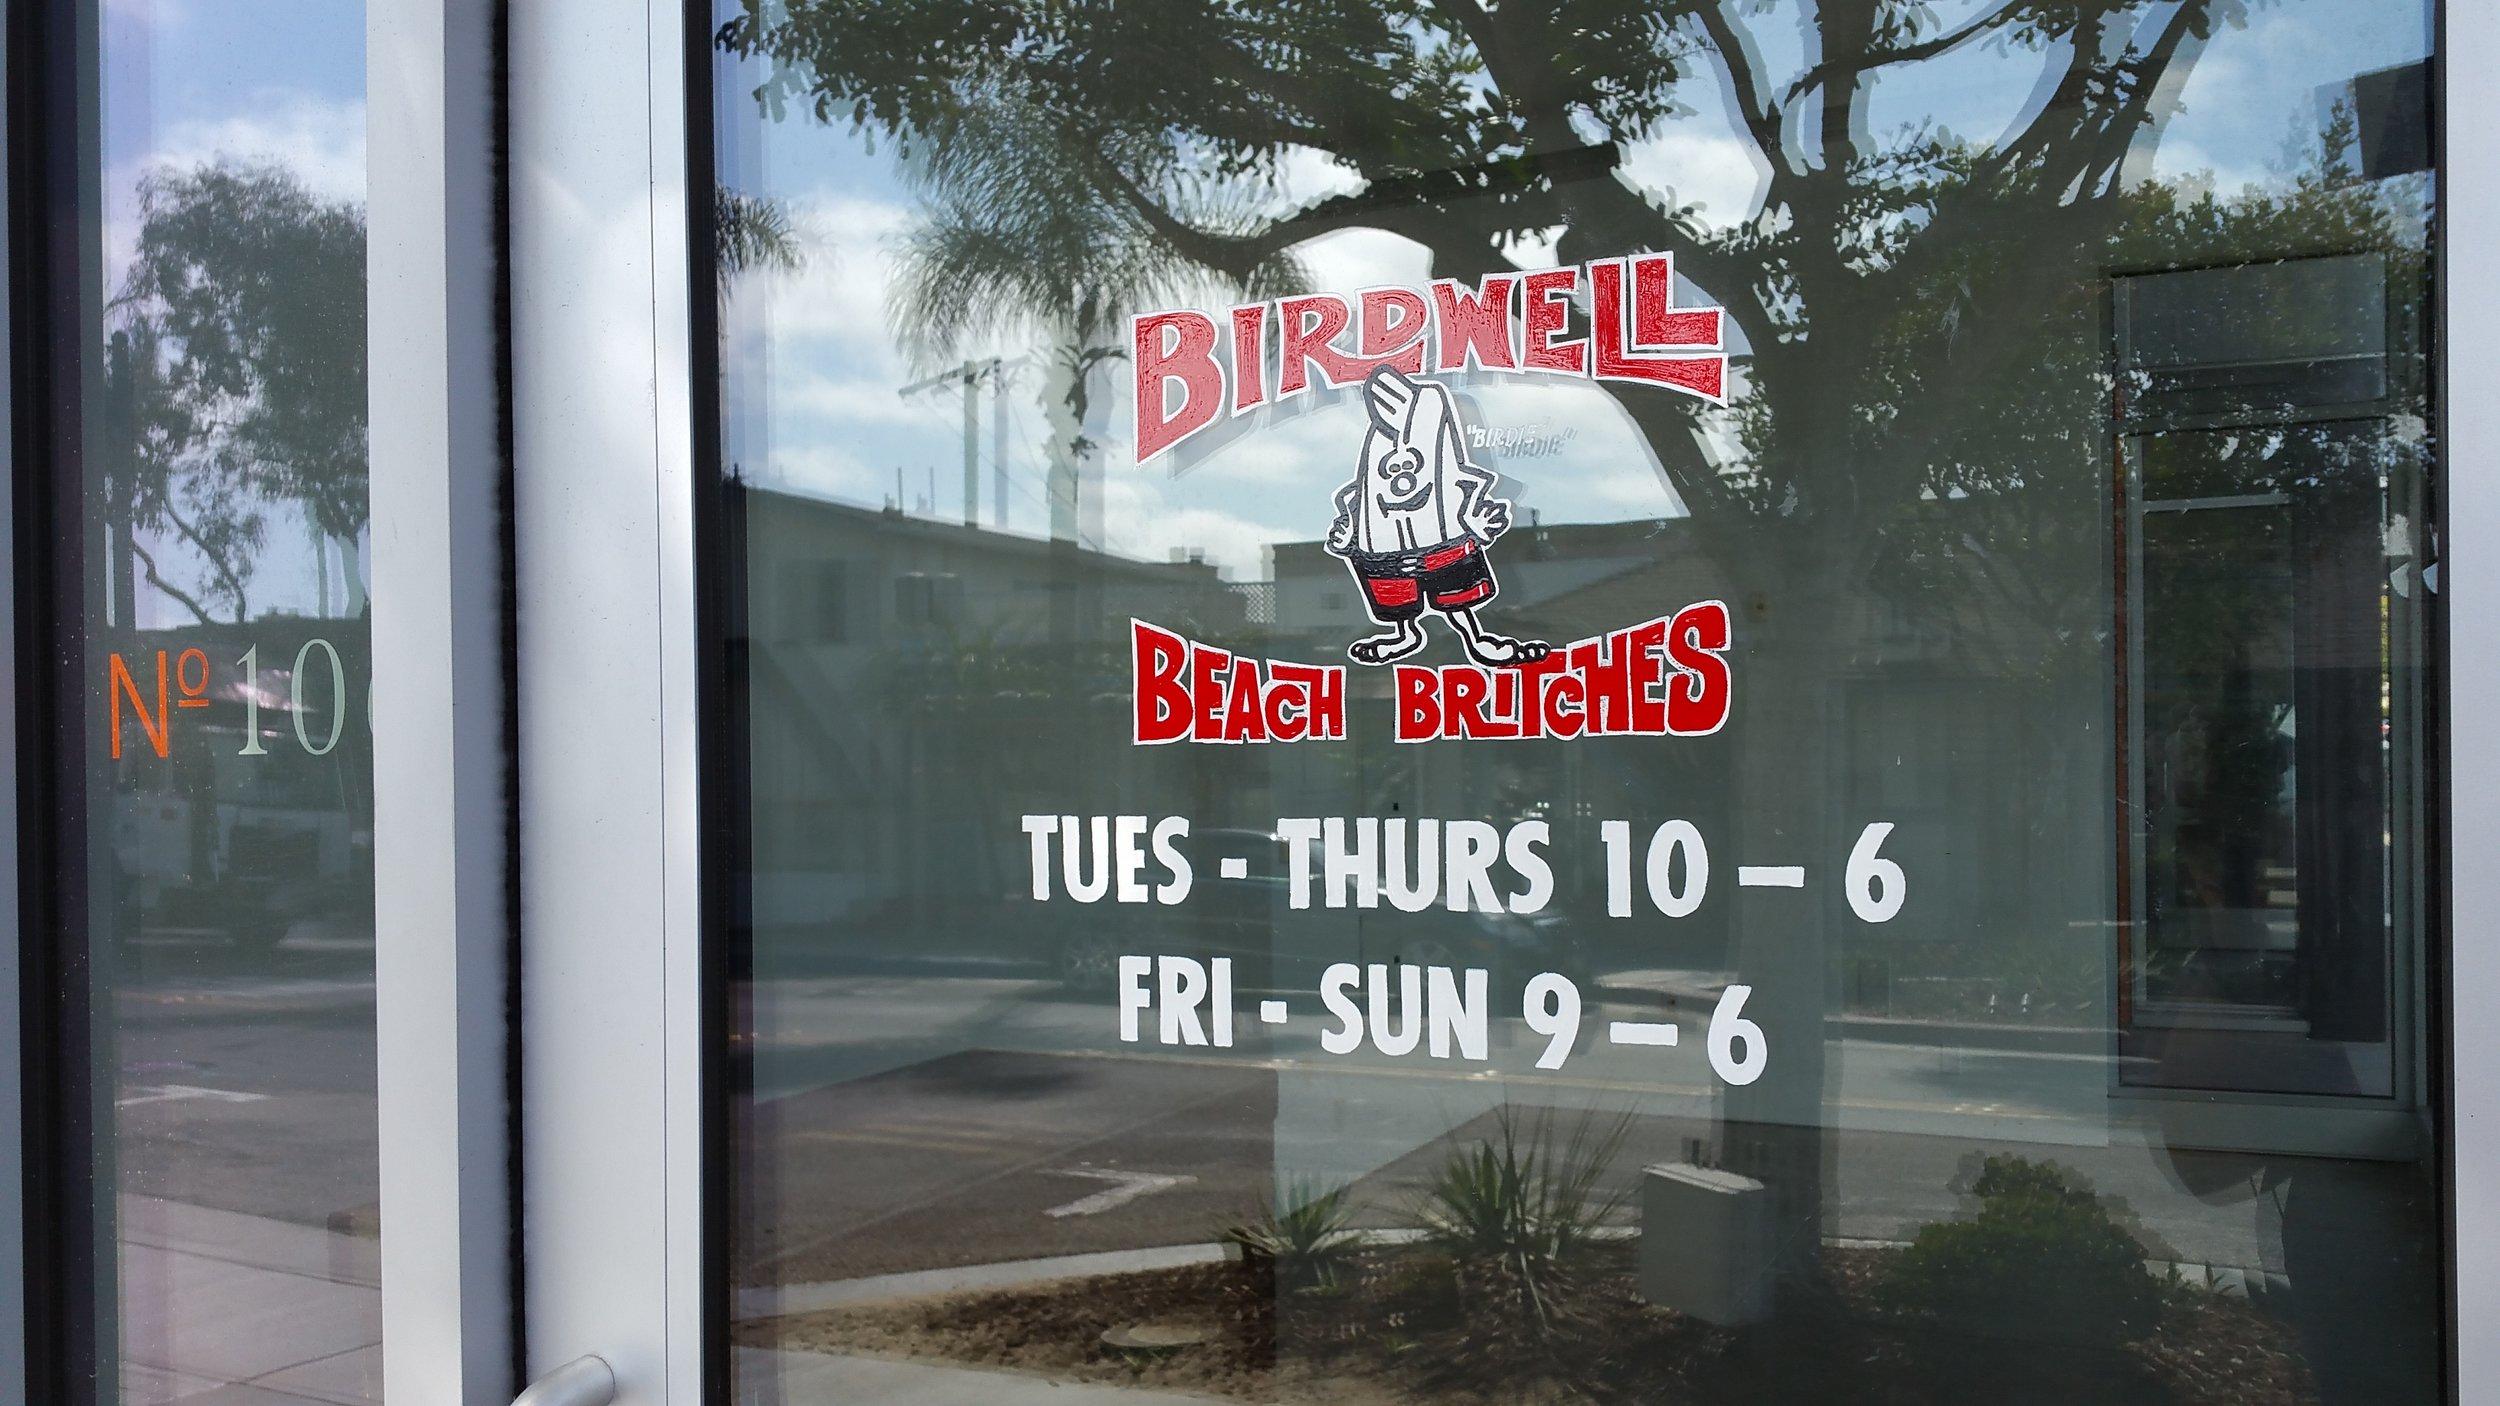 Birdwell Beach Britches hand lettered window sign detail